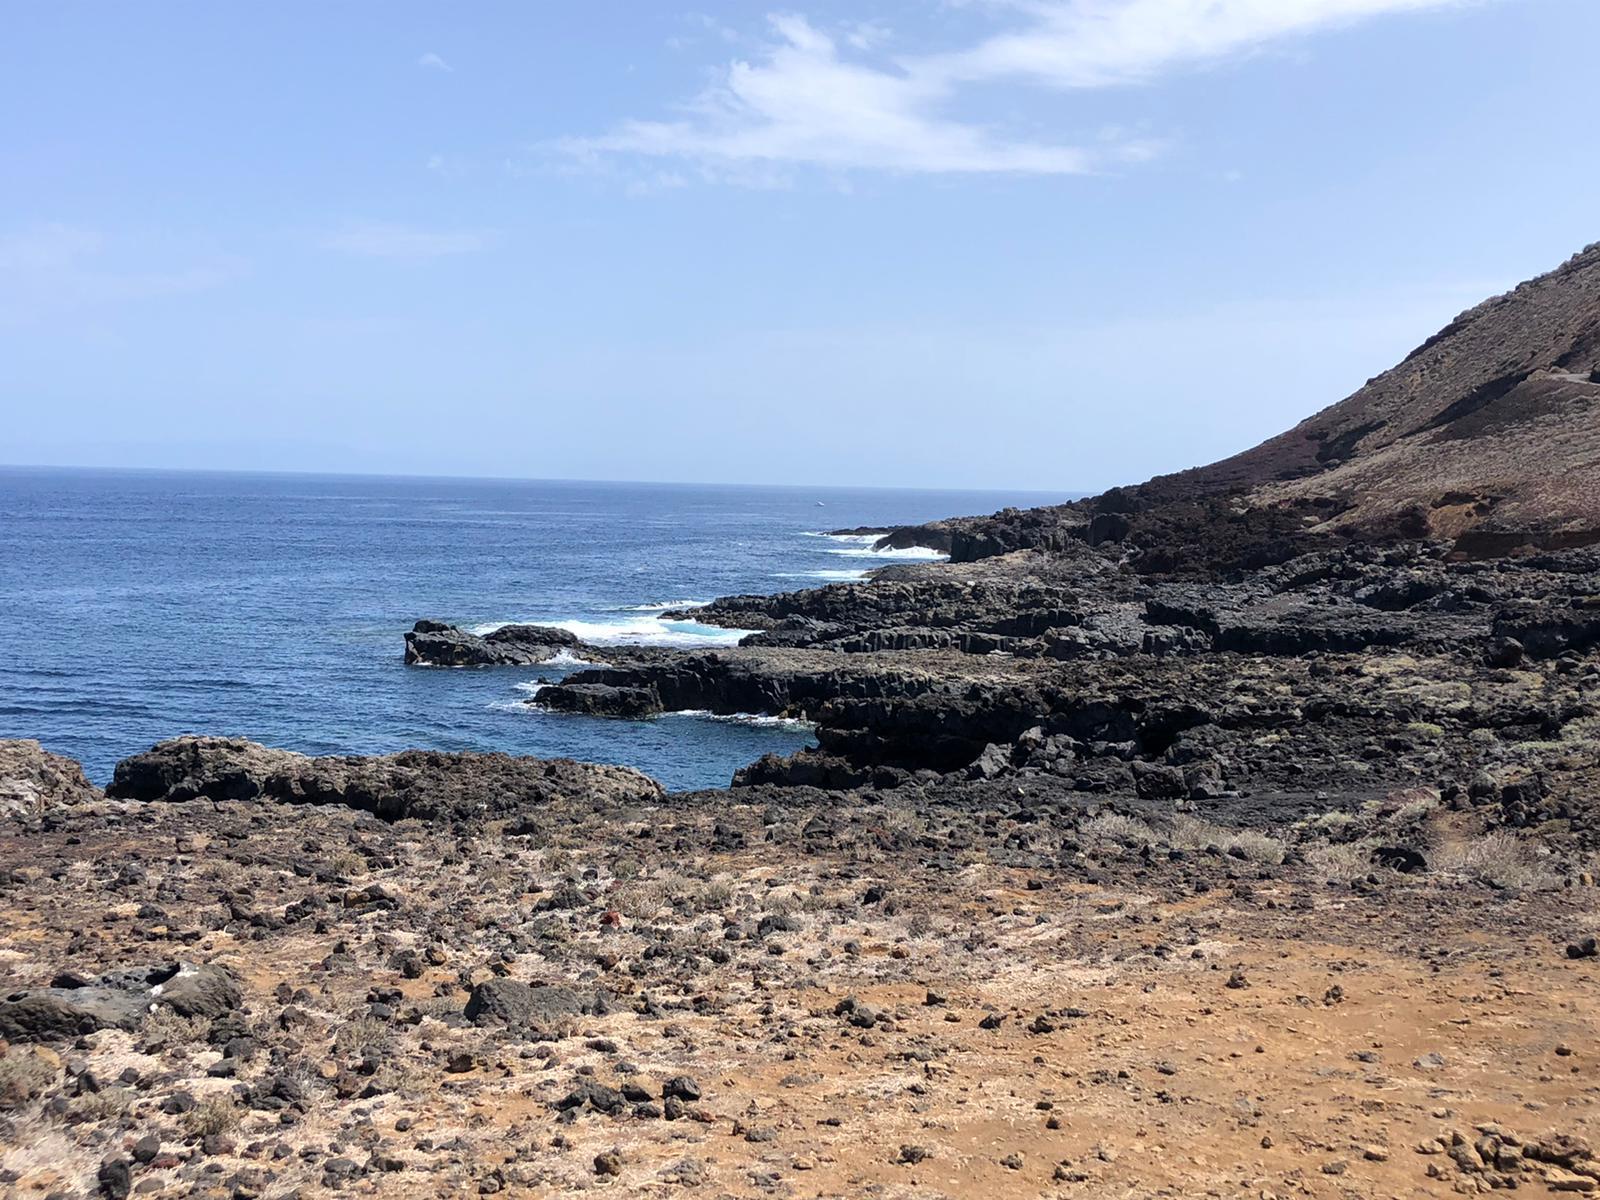 Strandwanderung Palm-Mar